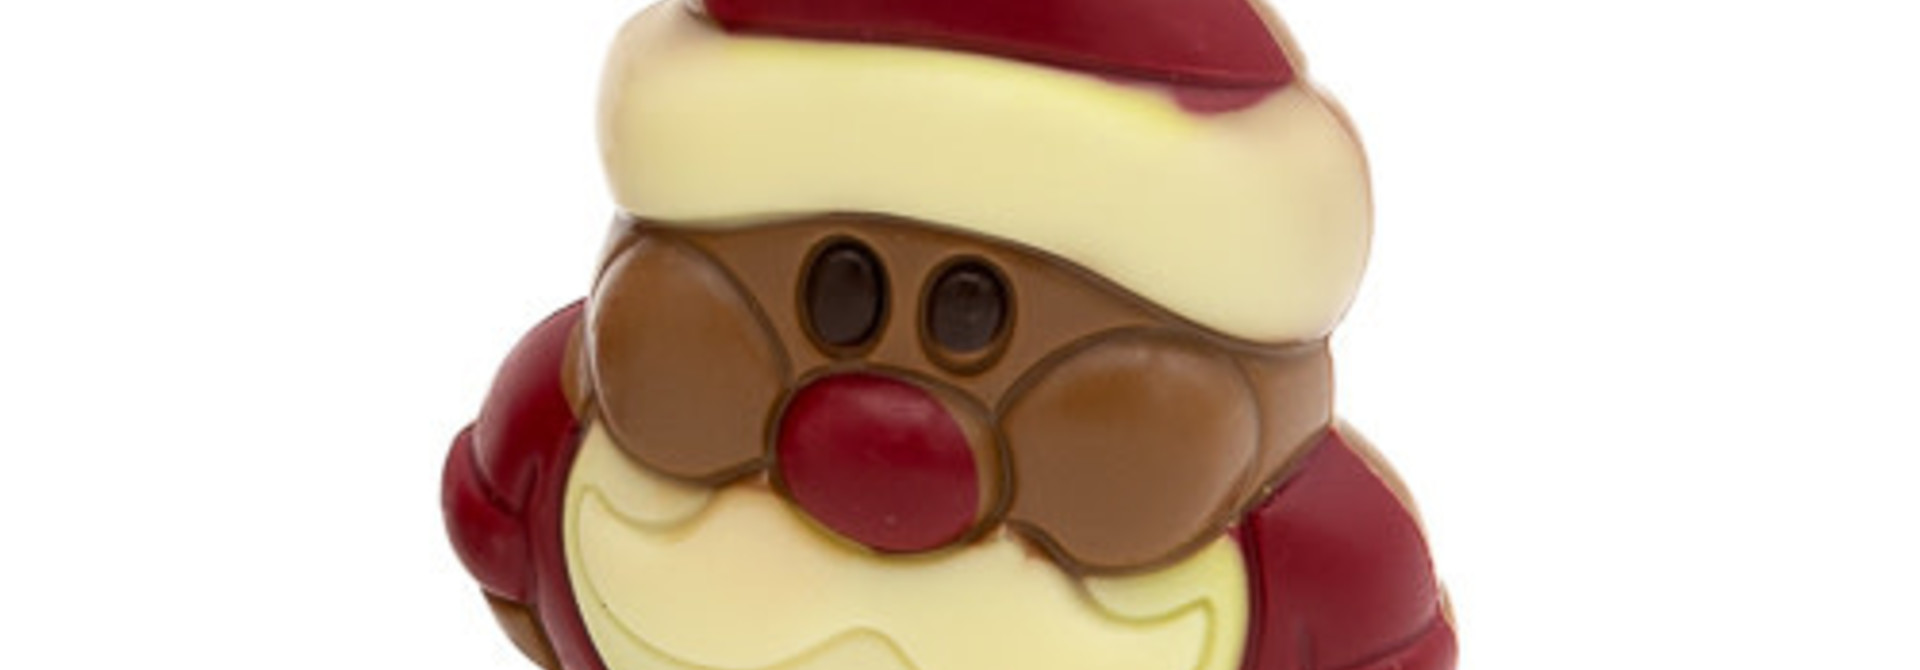 Hippy Santa Claus